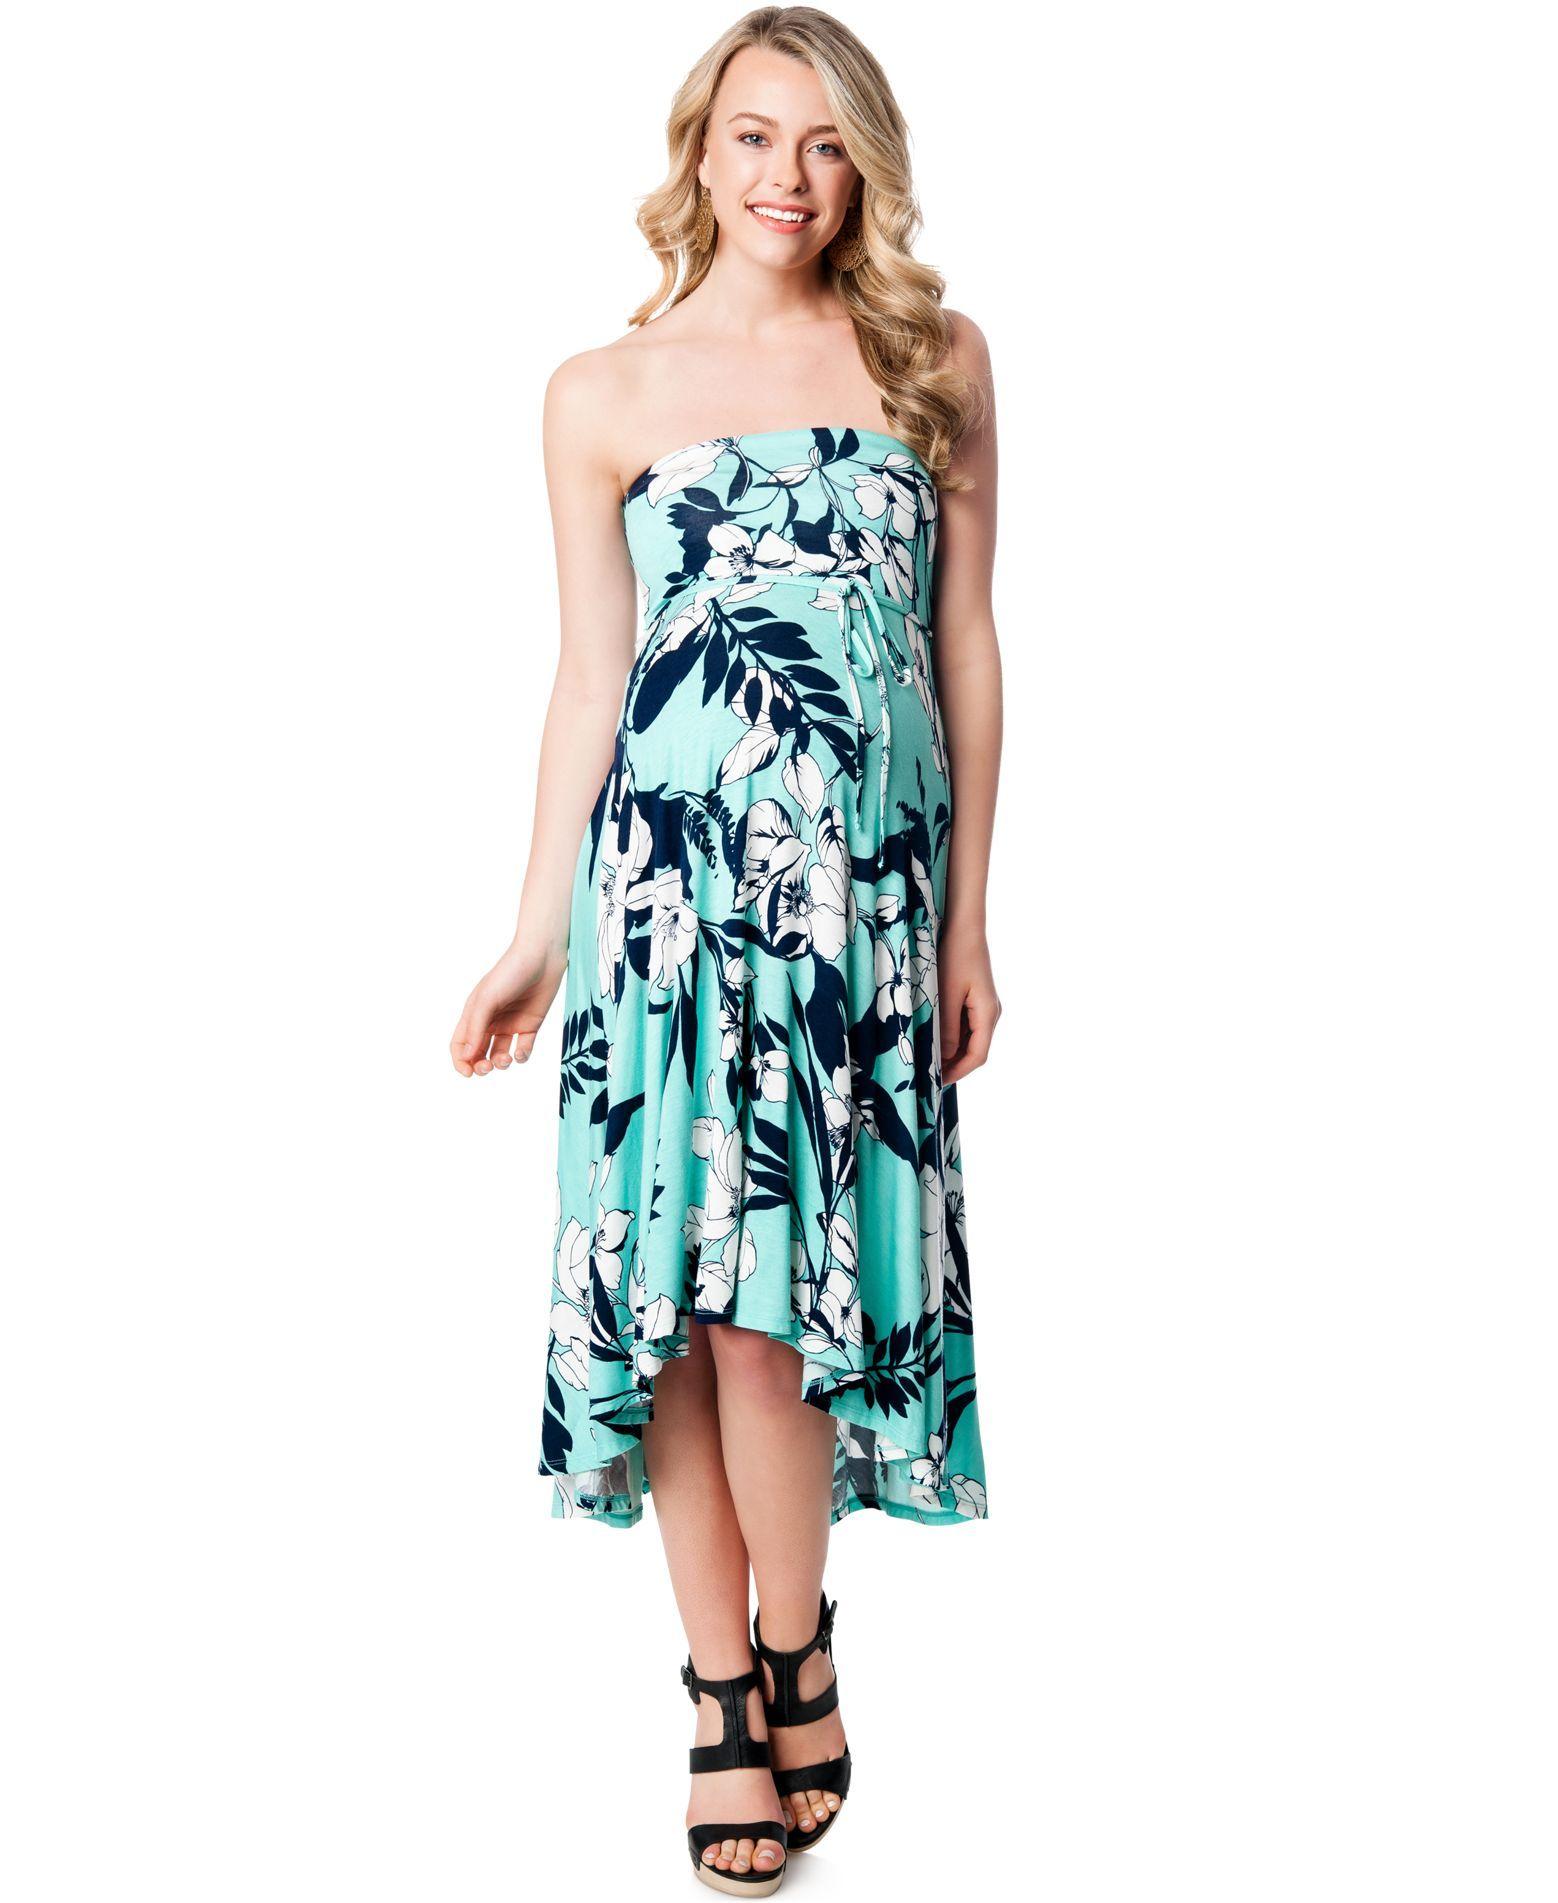 Modern Cocktail Dress Macys Pattern - All Wedding Dresses ...